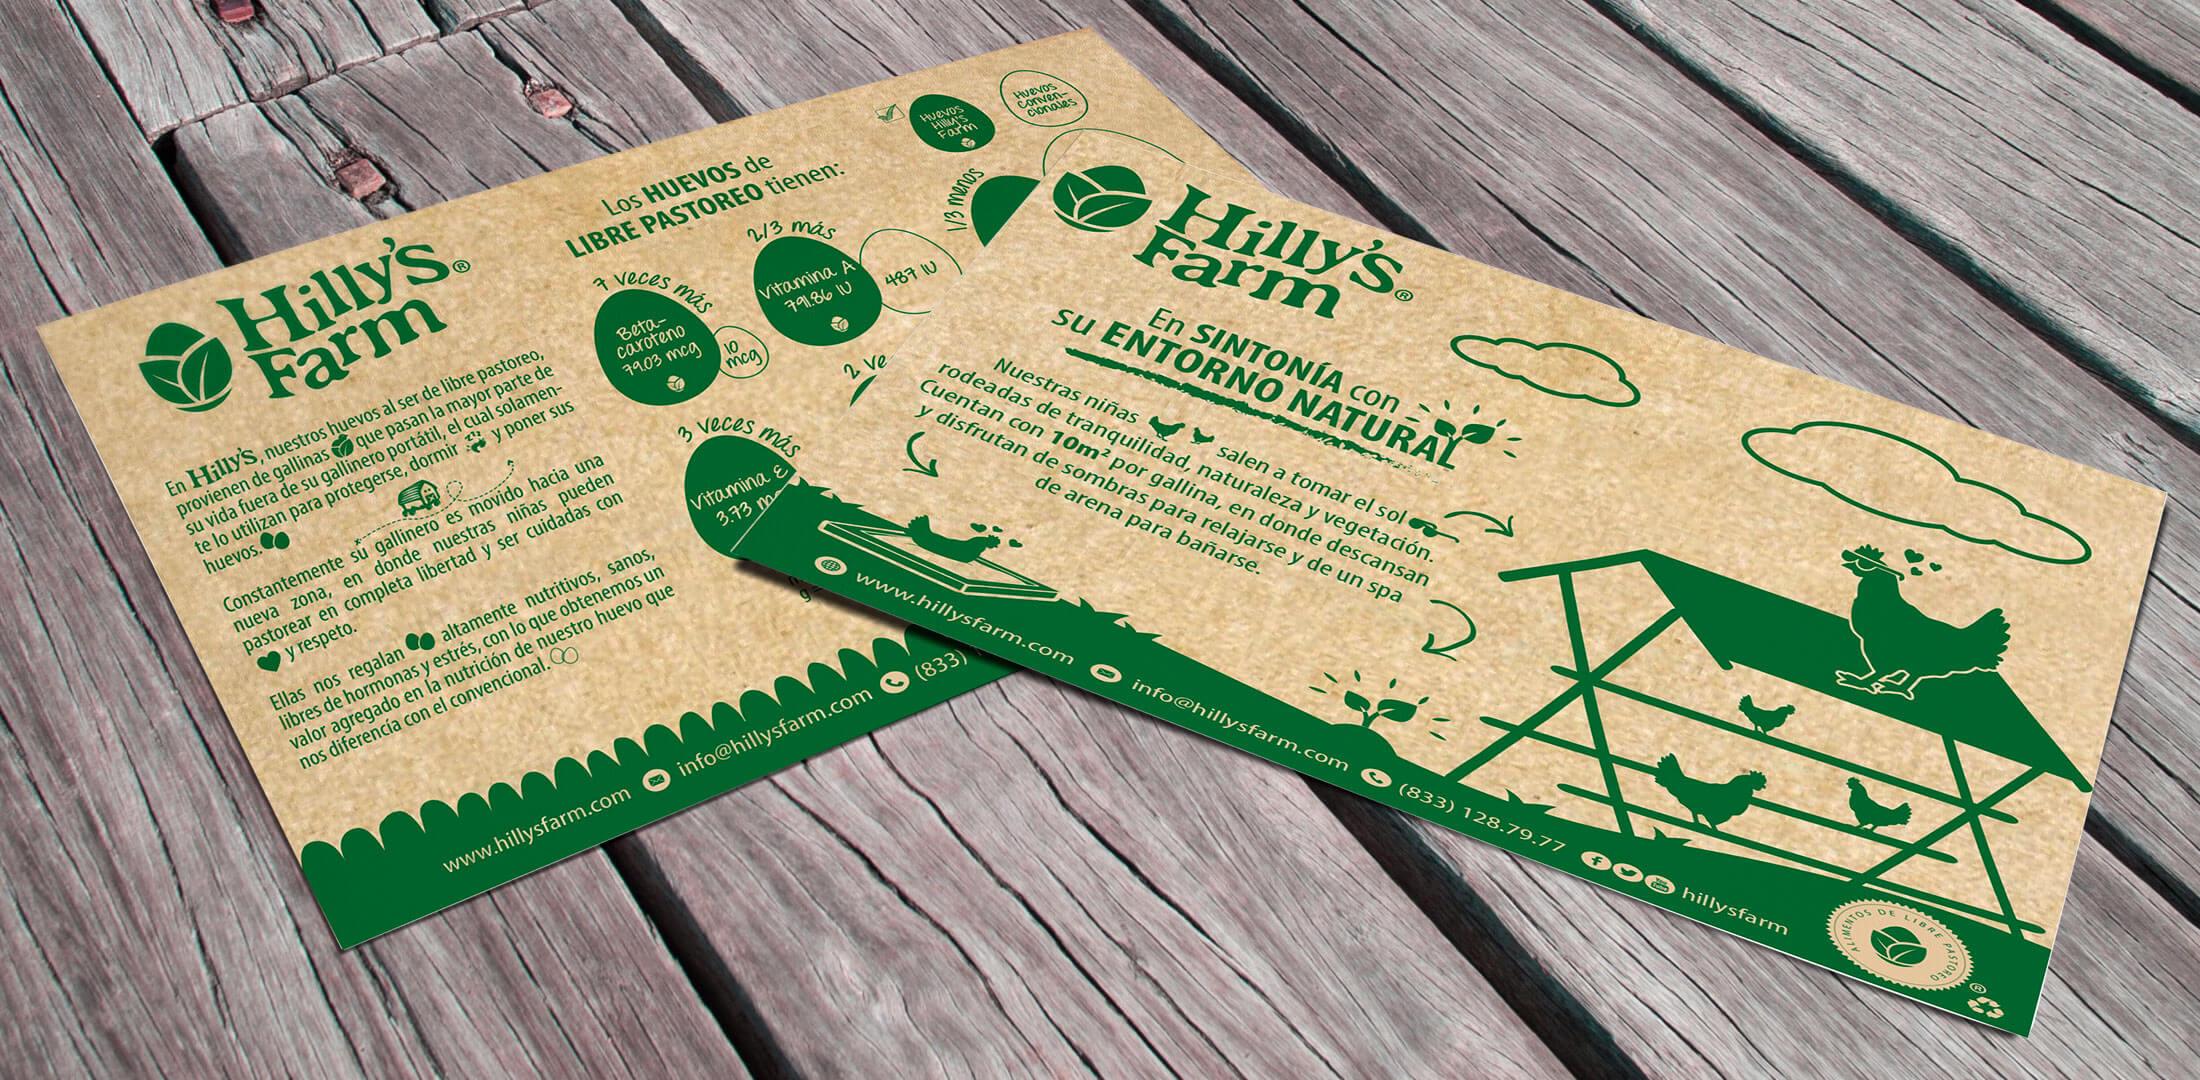 Diseño de Volantes para Huevos de Libre Pastoreo Hillys Farm - Lilian Feres